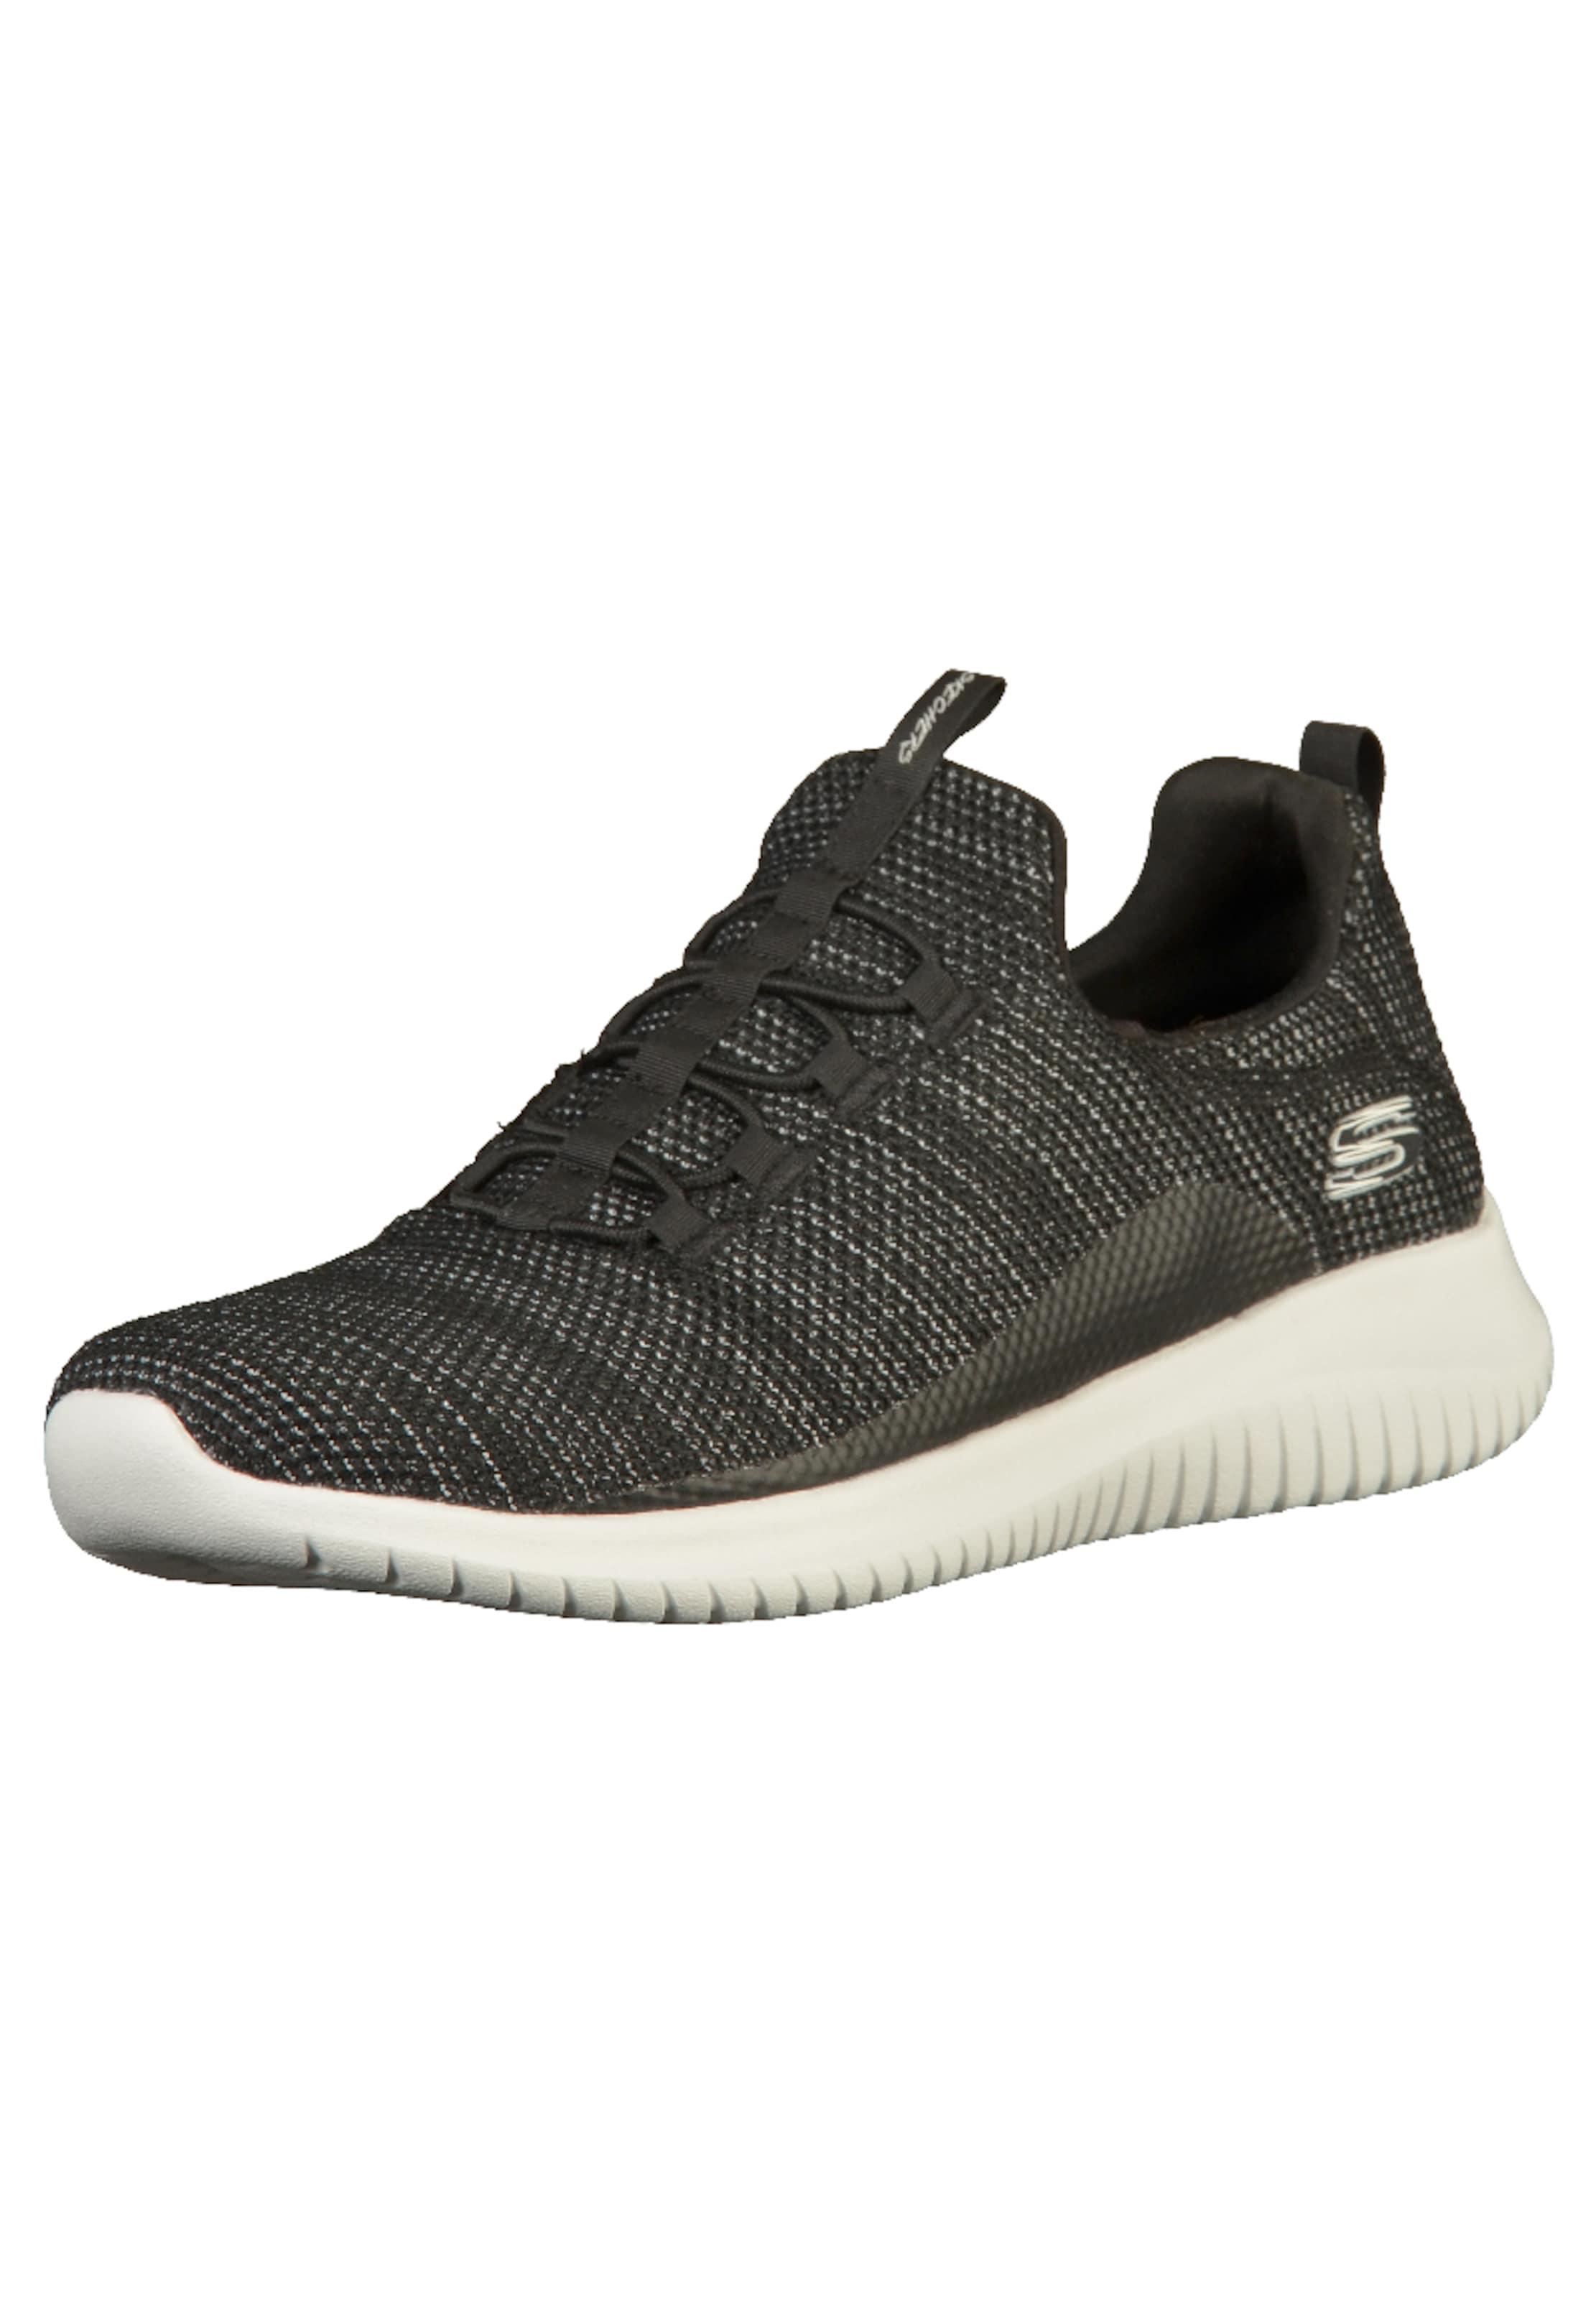 Skechers Sneakers Flex Ultra Bas - Capsule Noir G1R1rX